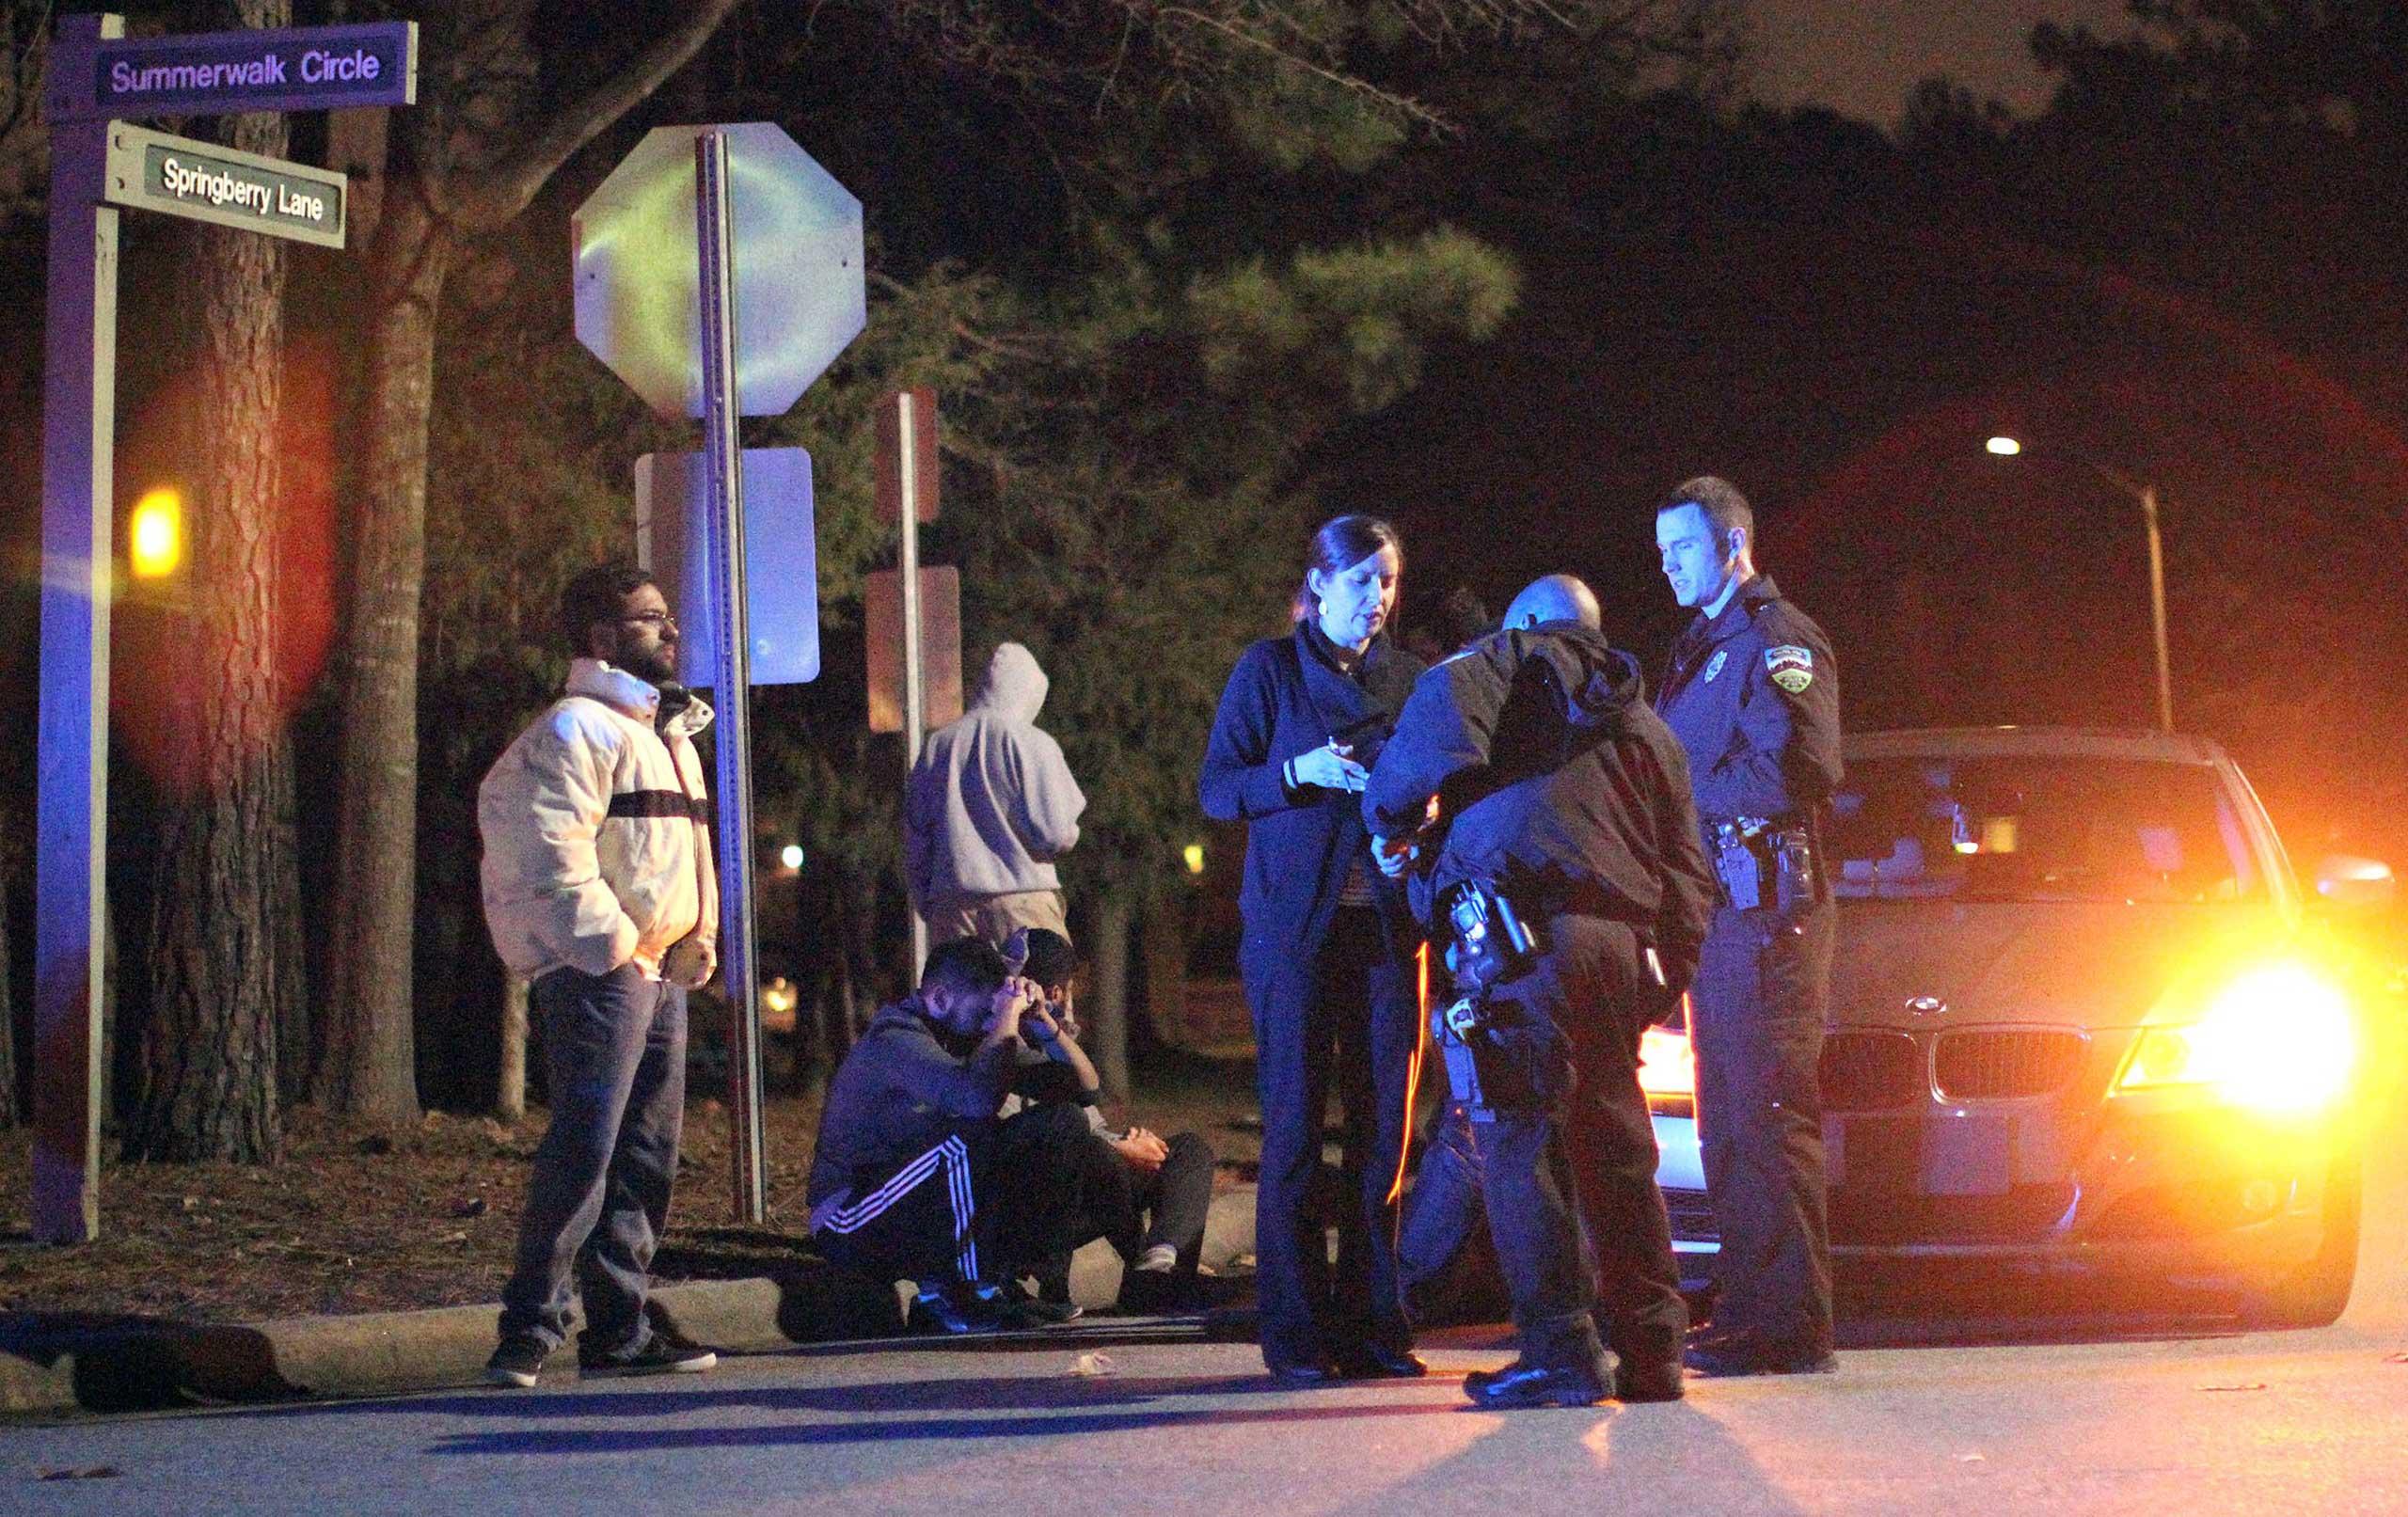 Chapel Hill police officers investigate the scene of three murders near Summerwalk Circle in Chapel Hill, N.C., Feb. 10, 2015.